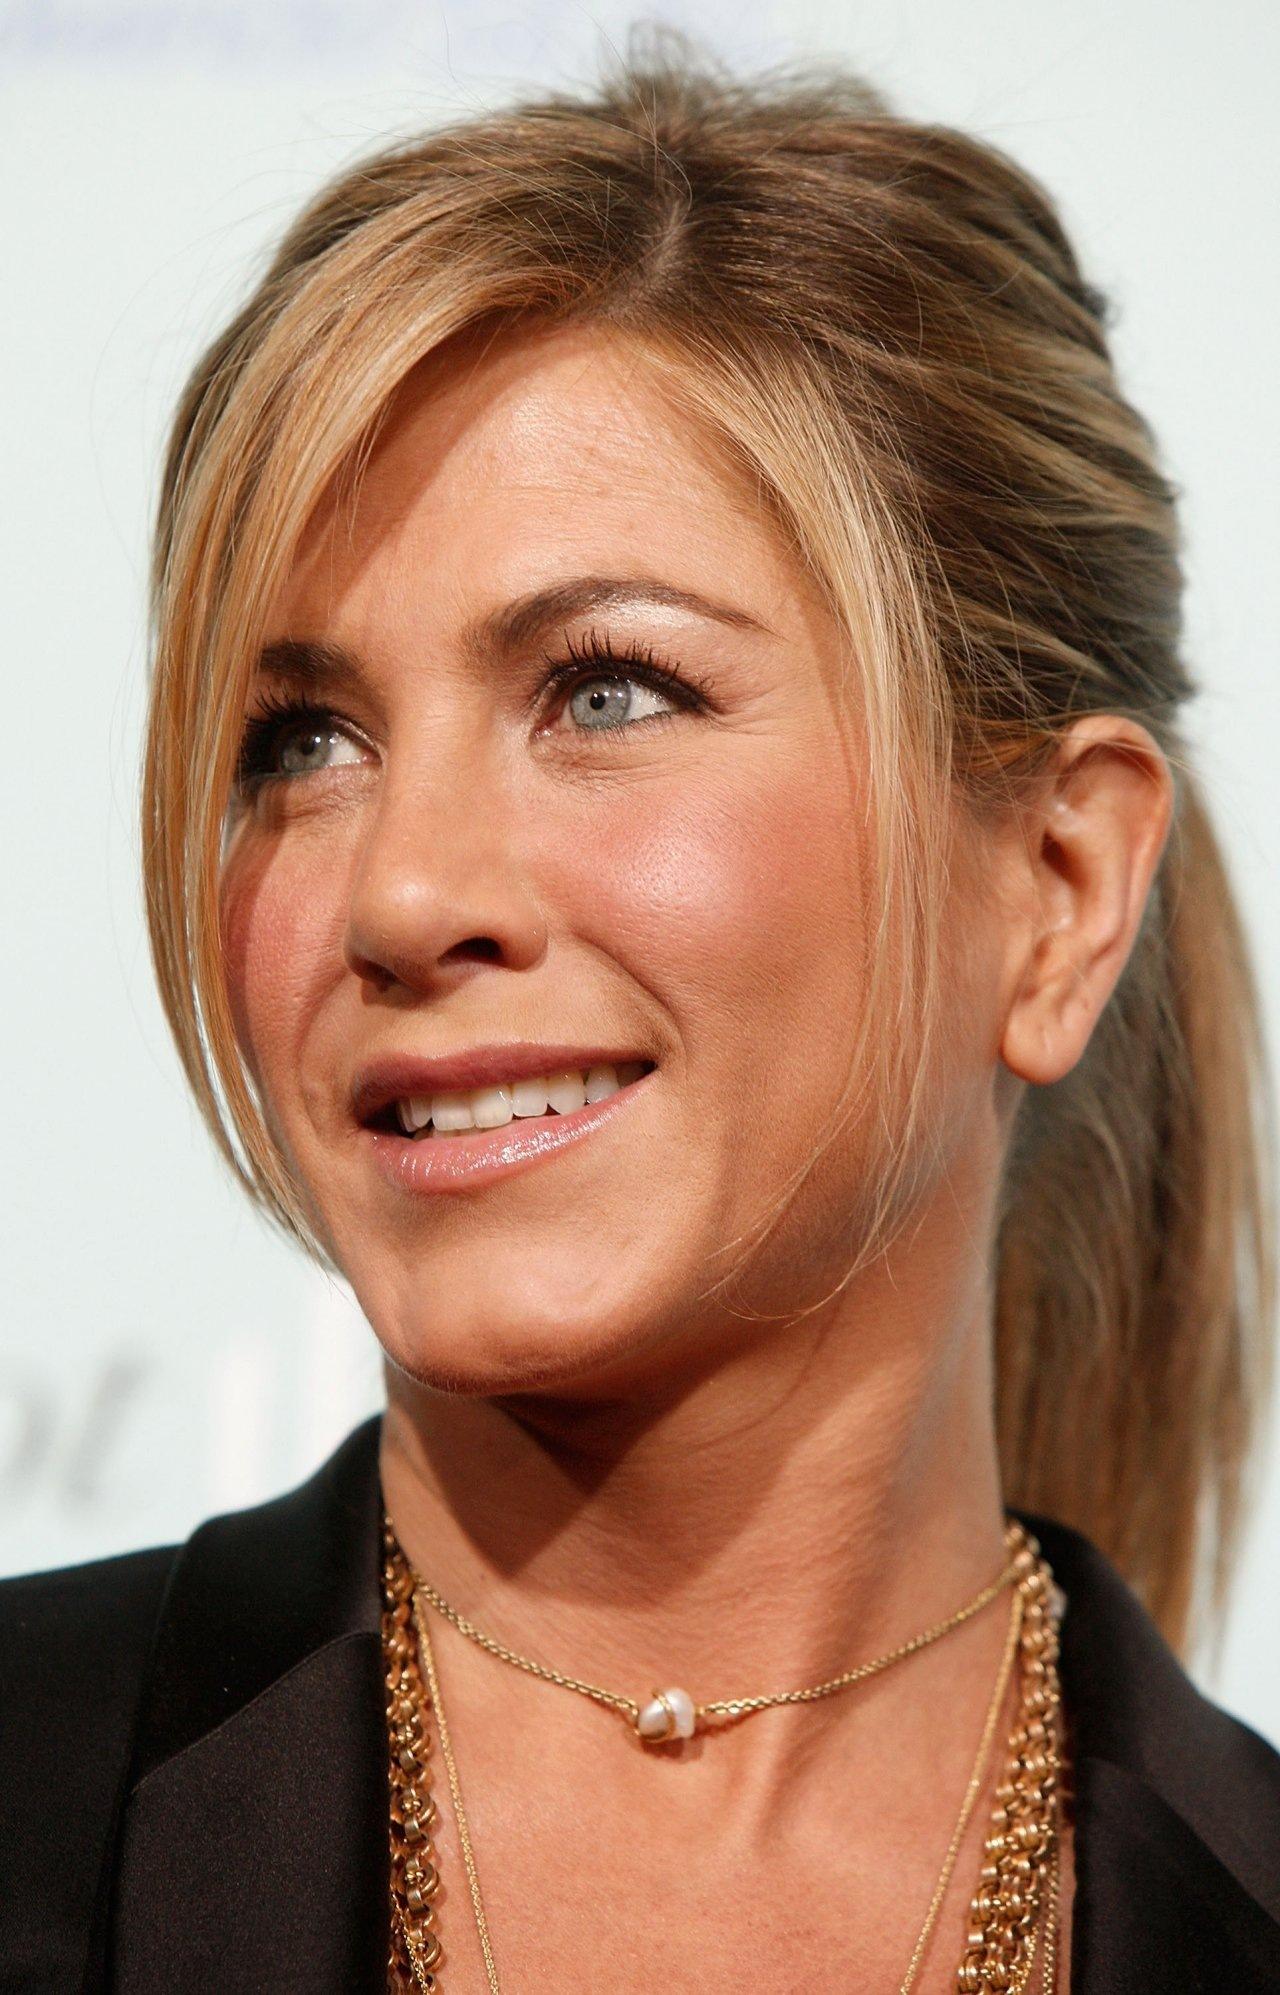 Jennifer Aniston Leaked Photos 70703 Best Celebrity